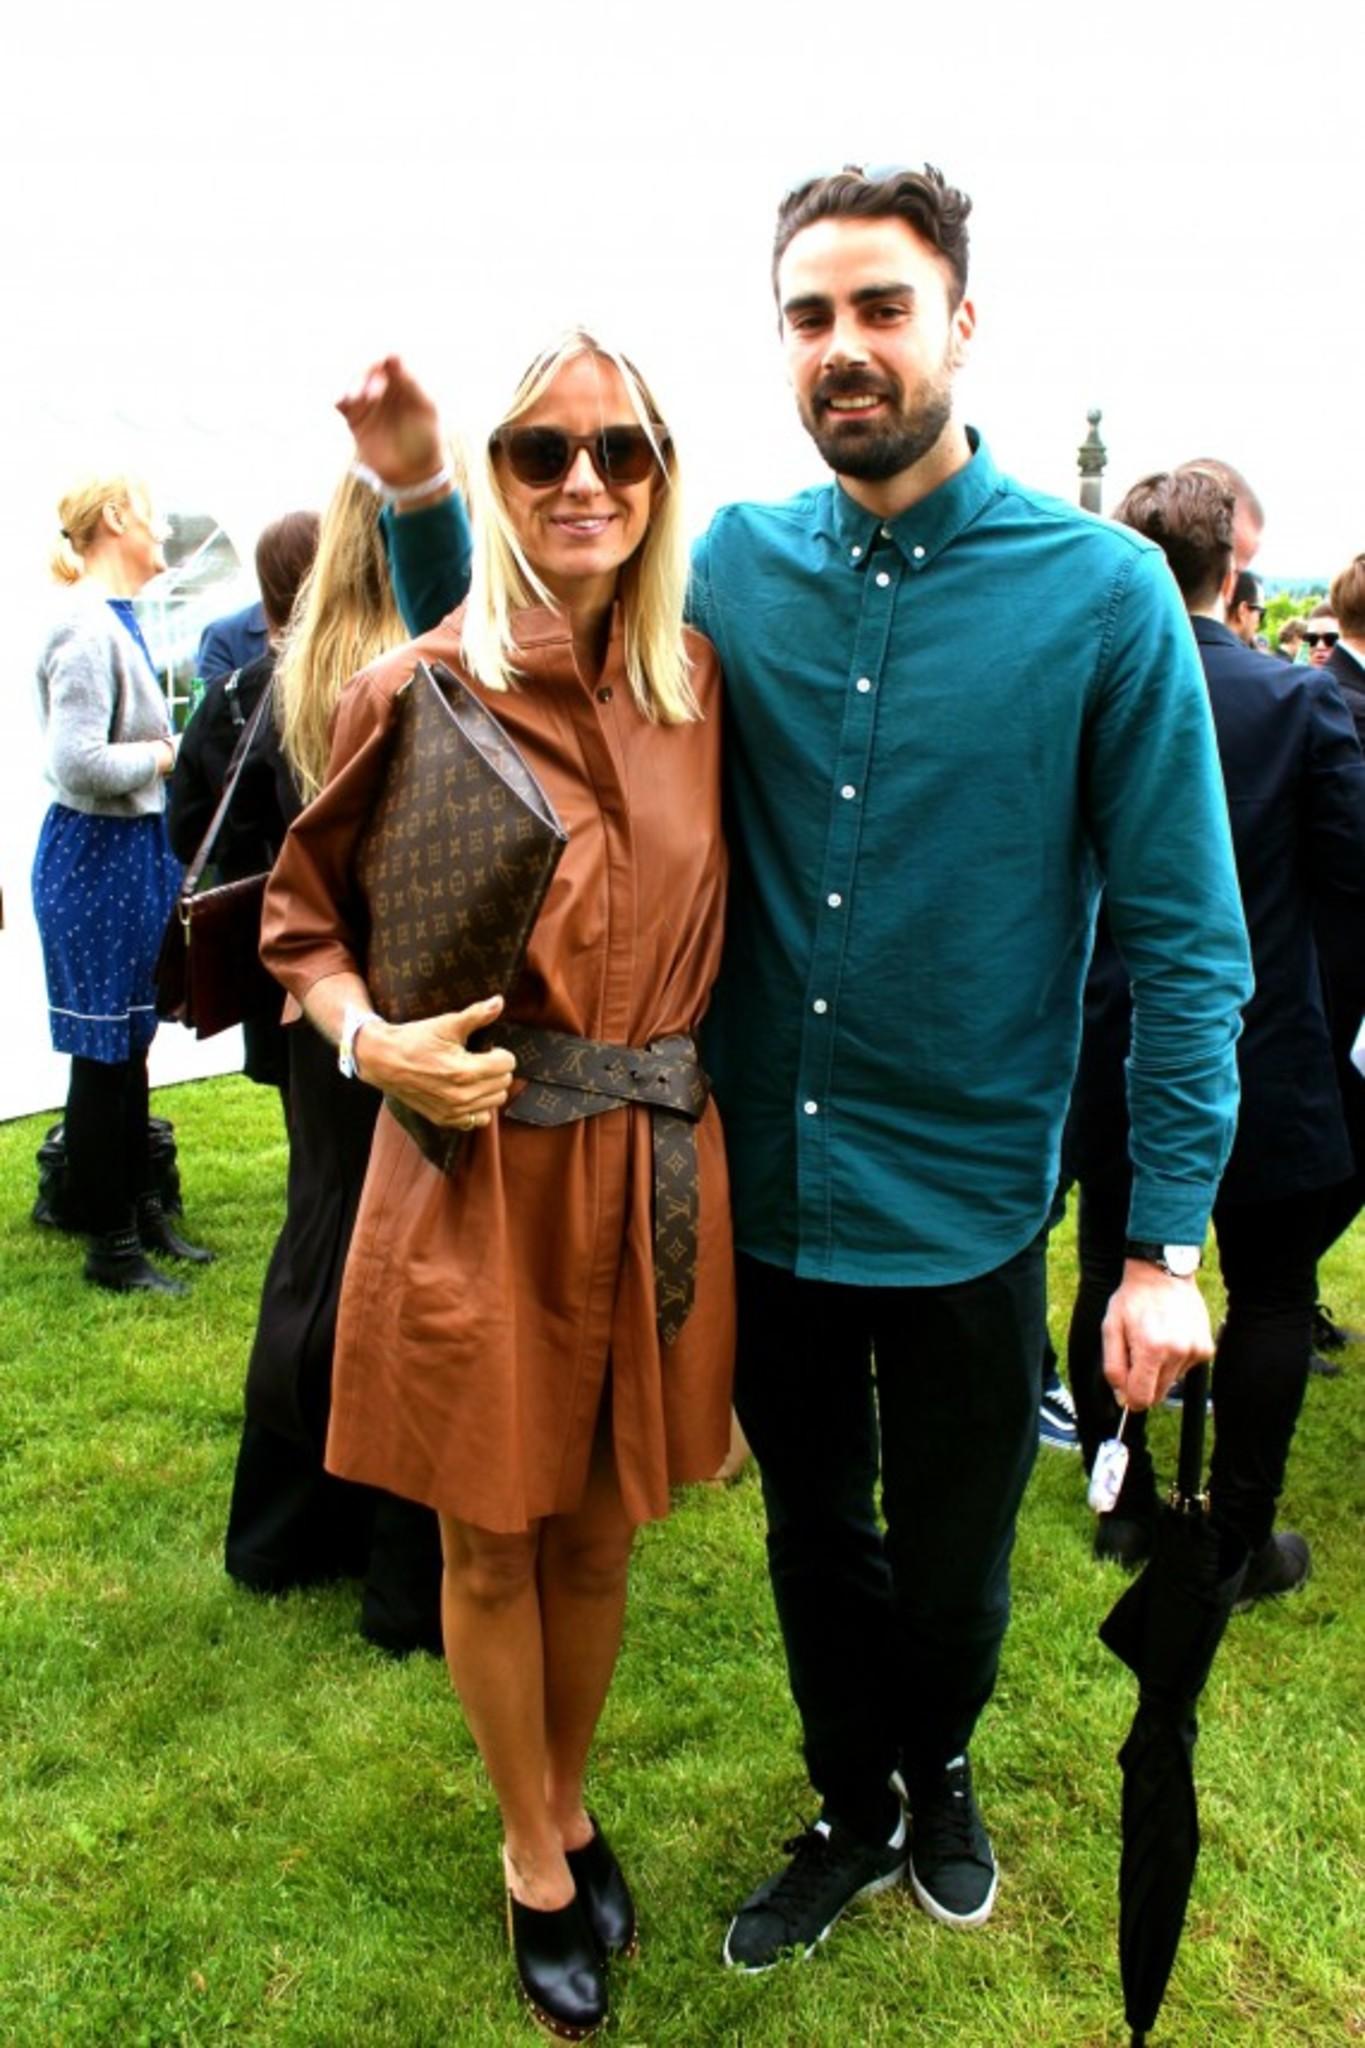 Celine Aagard & Tore Frisholm